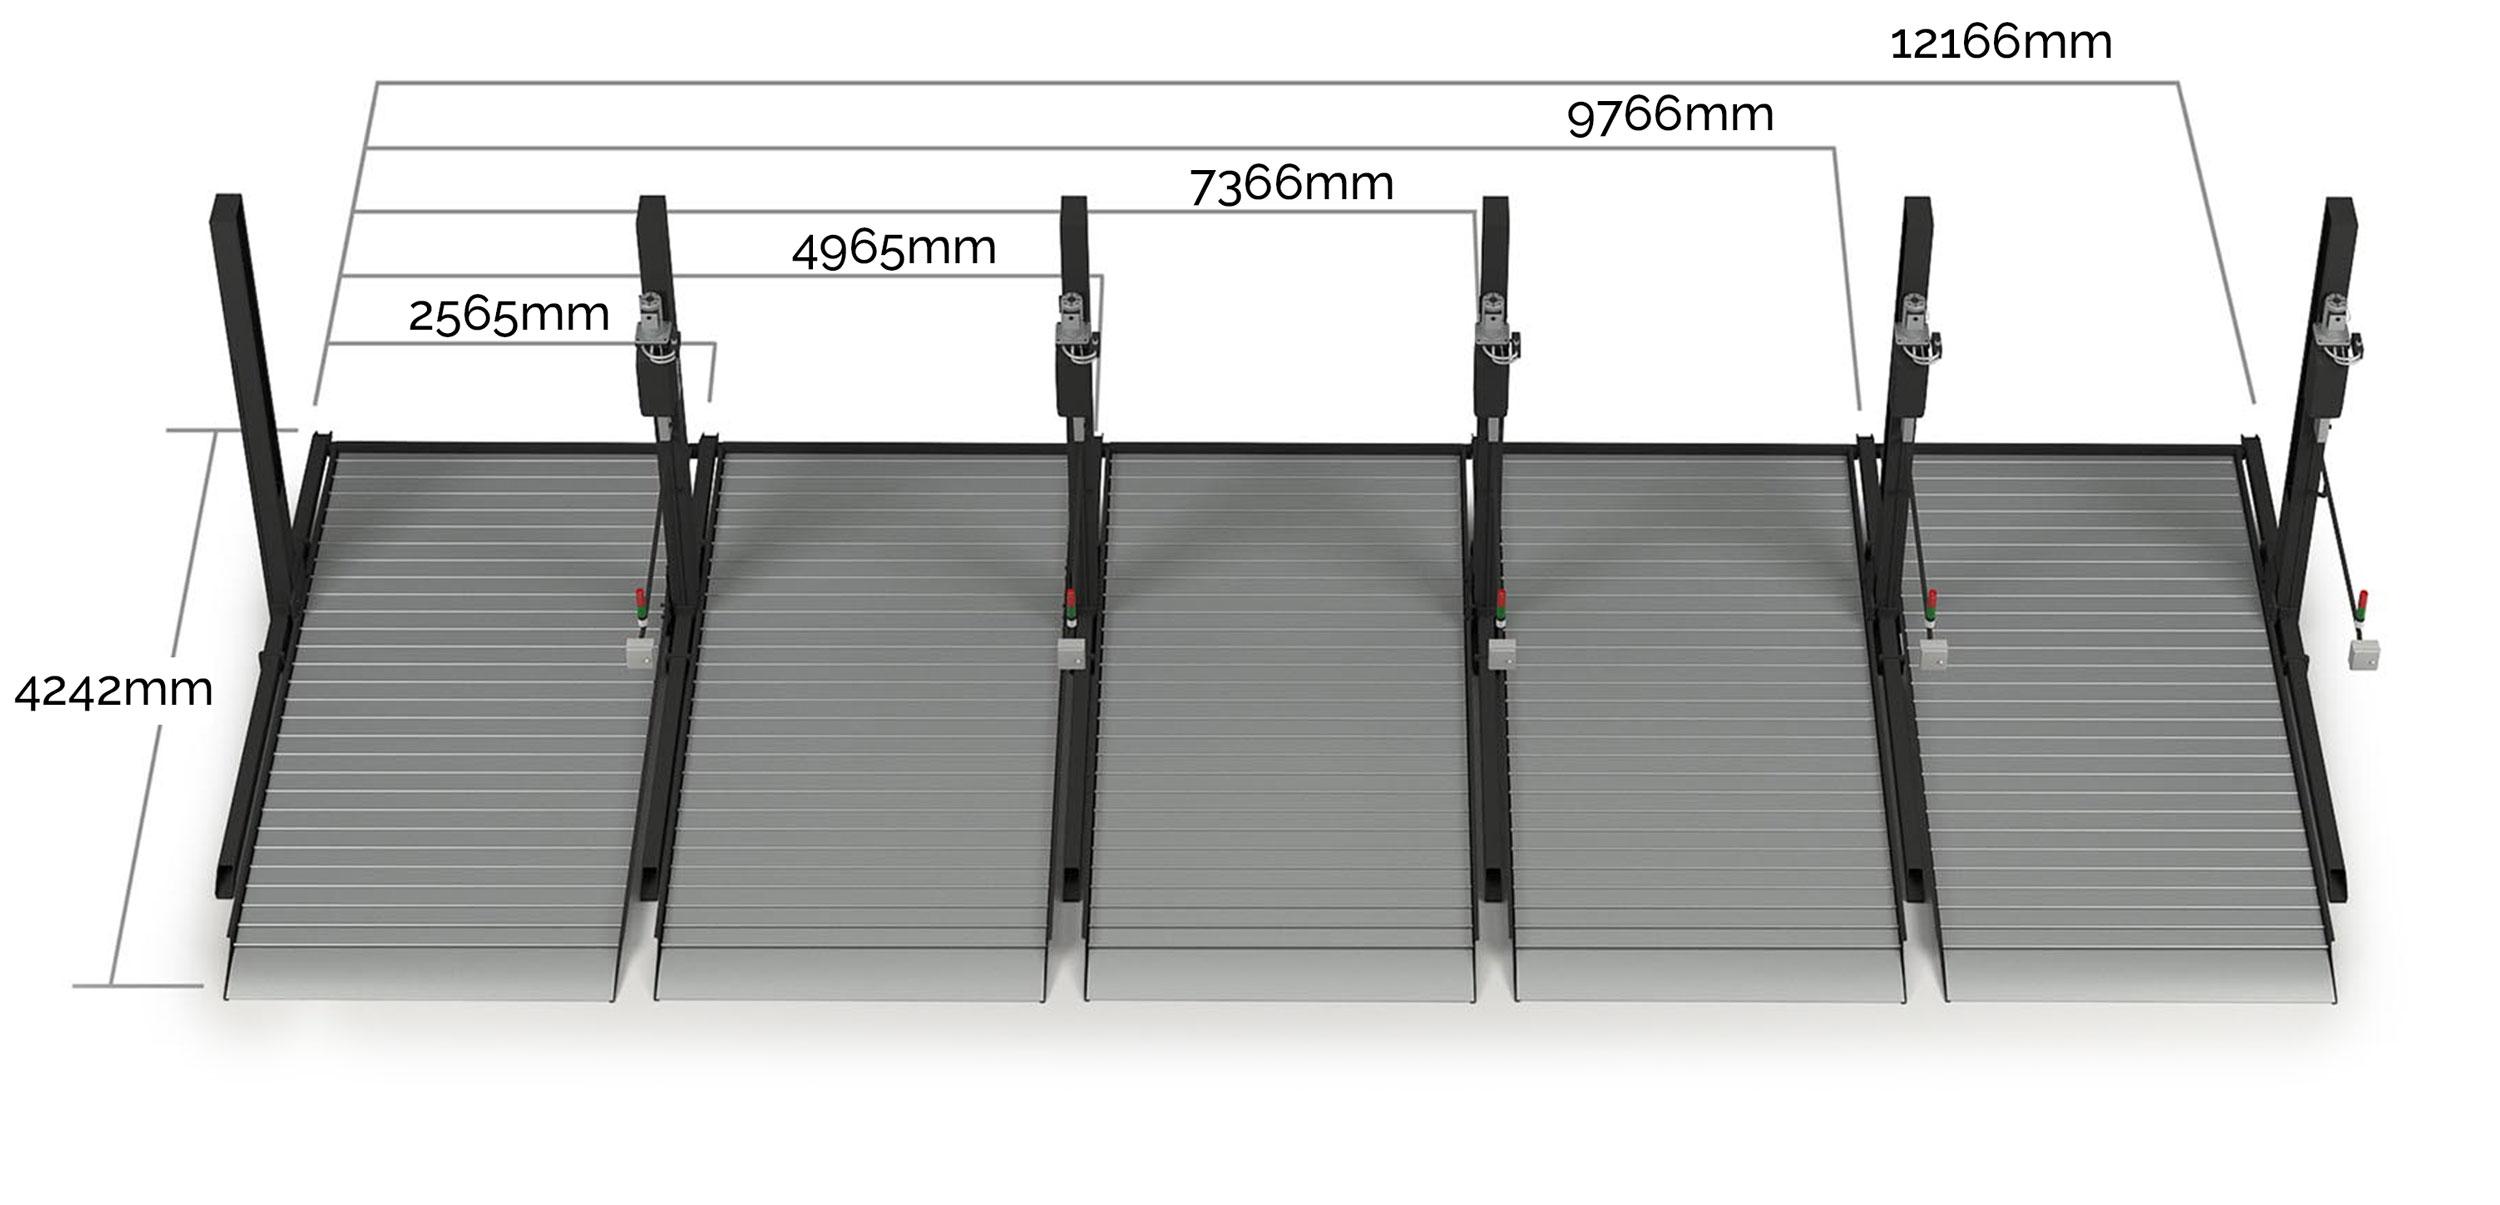 CLT Holland - meerdere 2 kolom Up Parkers - Afmetingen parkeerbrug, autolift